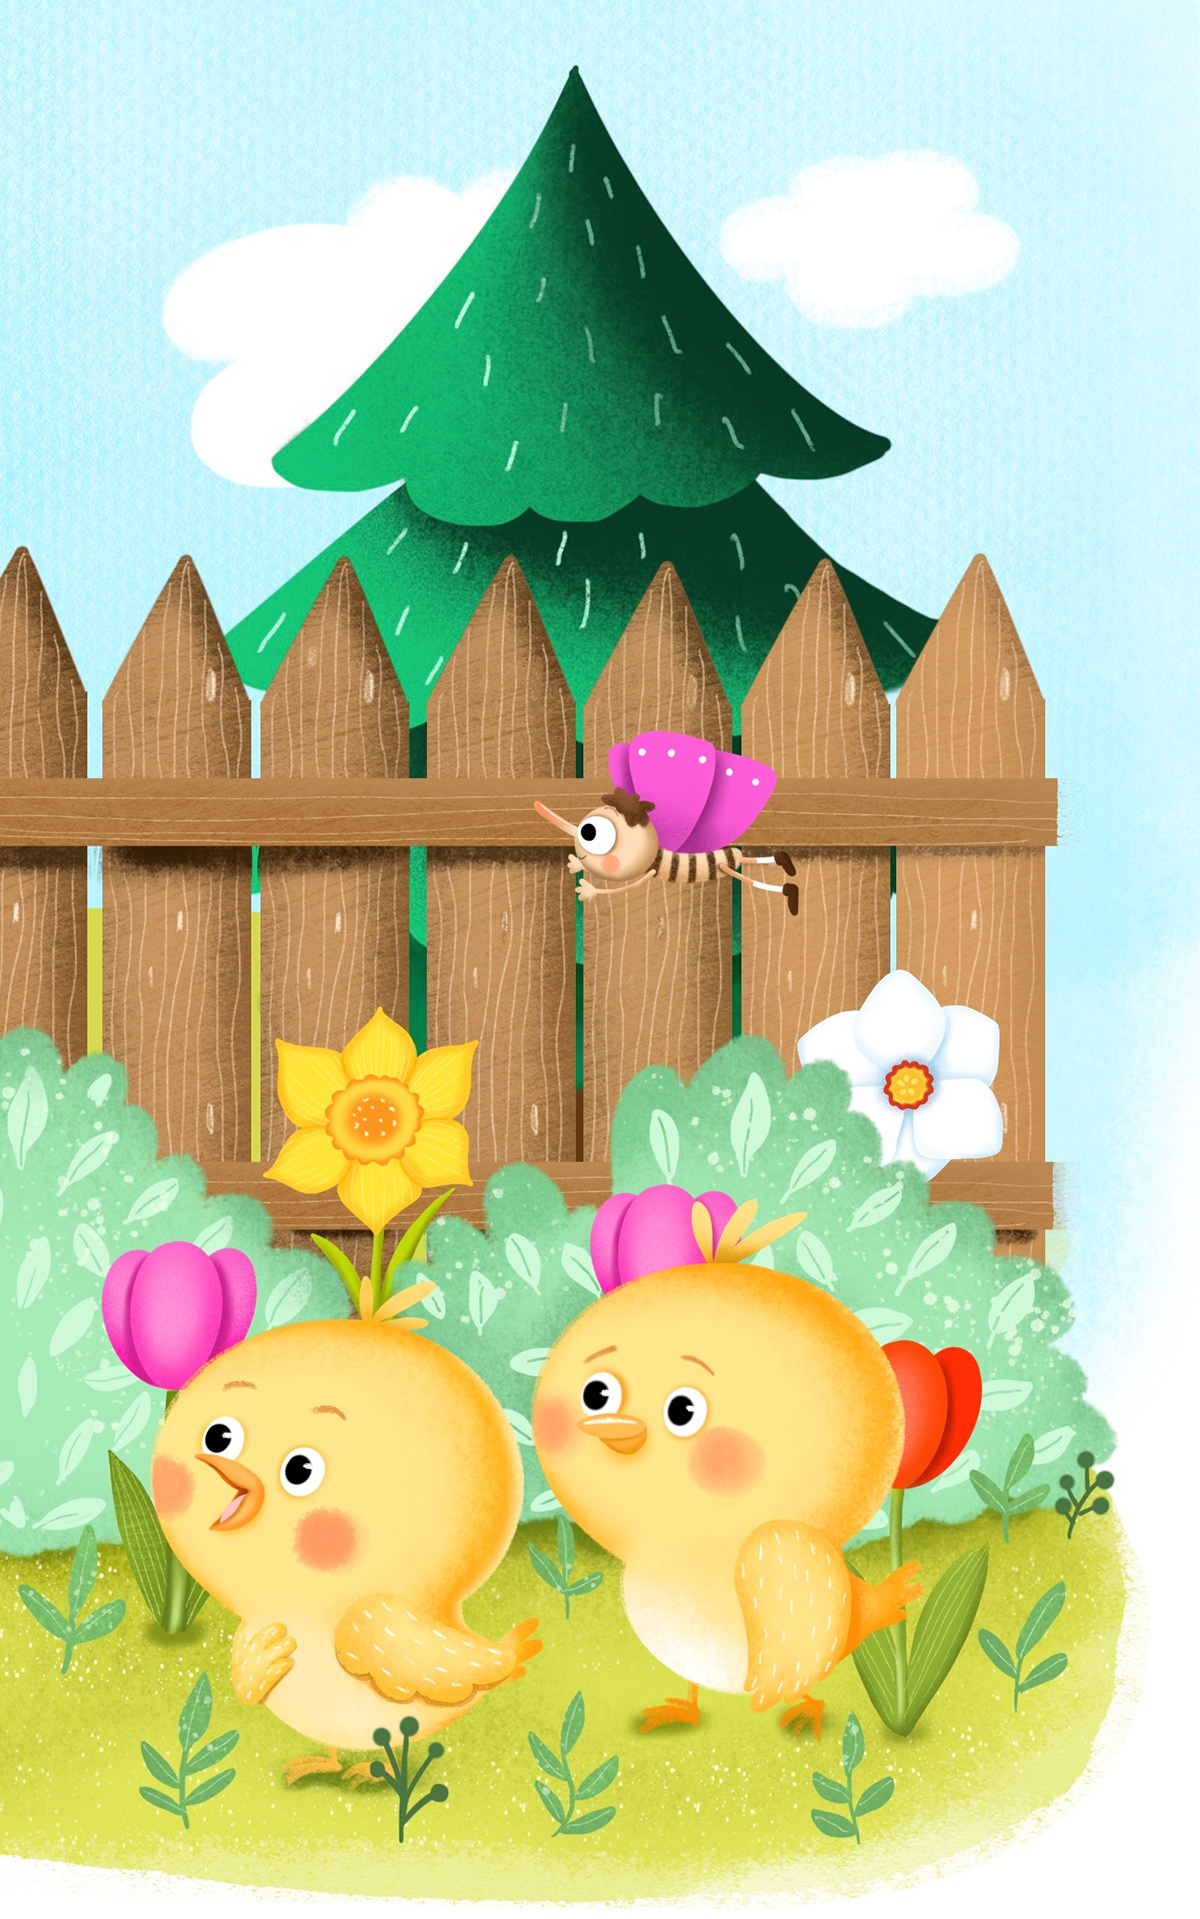 Character design  characterdesign chicken children's book cute cuteanimals digital illustration farm